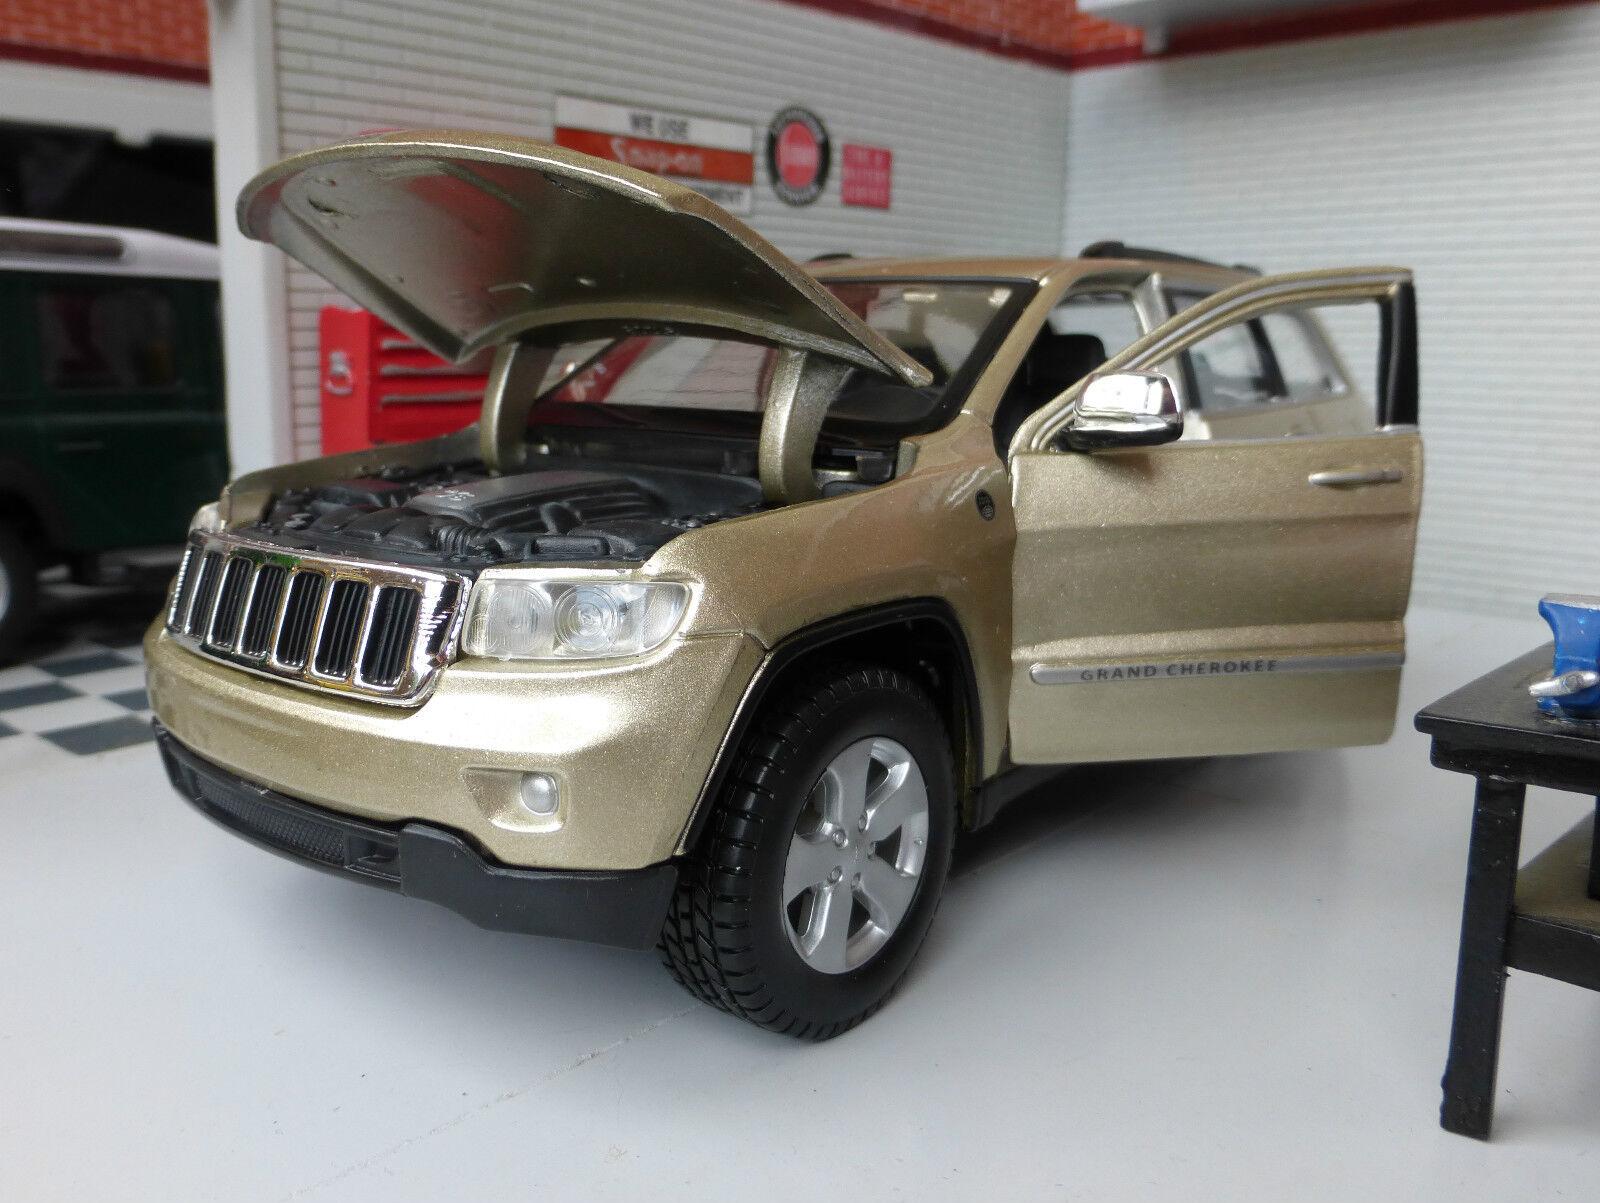 1 24 Scale gold Jeep Grand Cherokee Laredo V8 4x4 Detailed Diecast Maisto Model